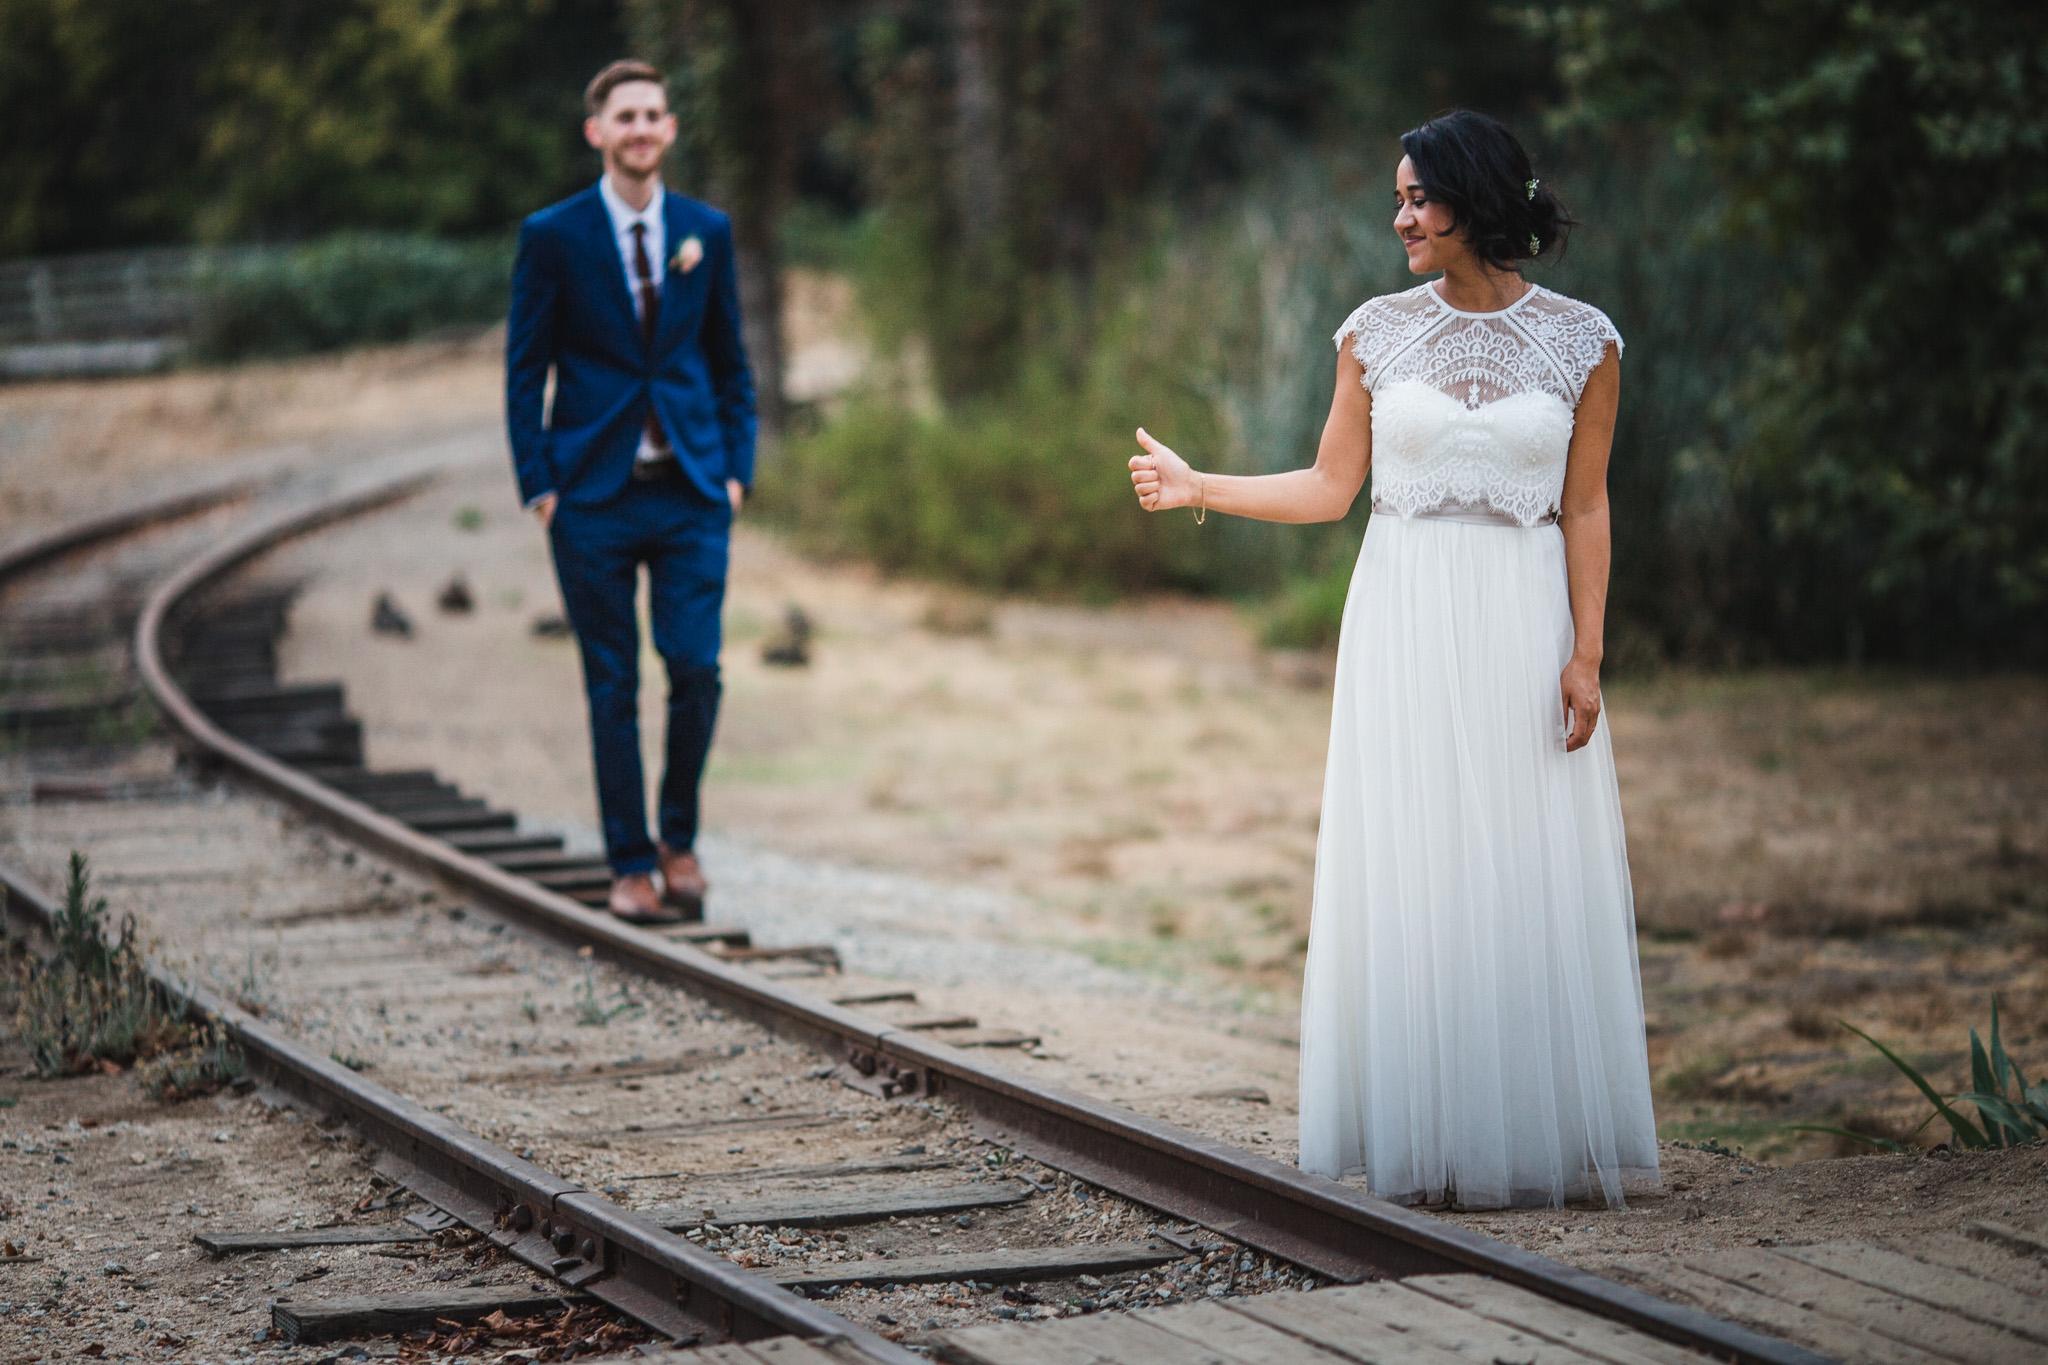 Eli Zaturanski Photography - Artistic Wedding Photographer